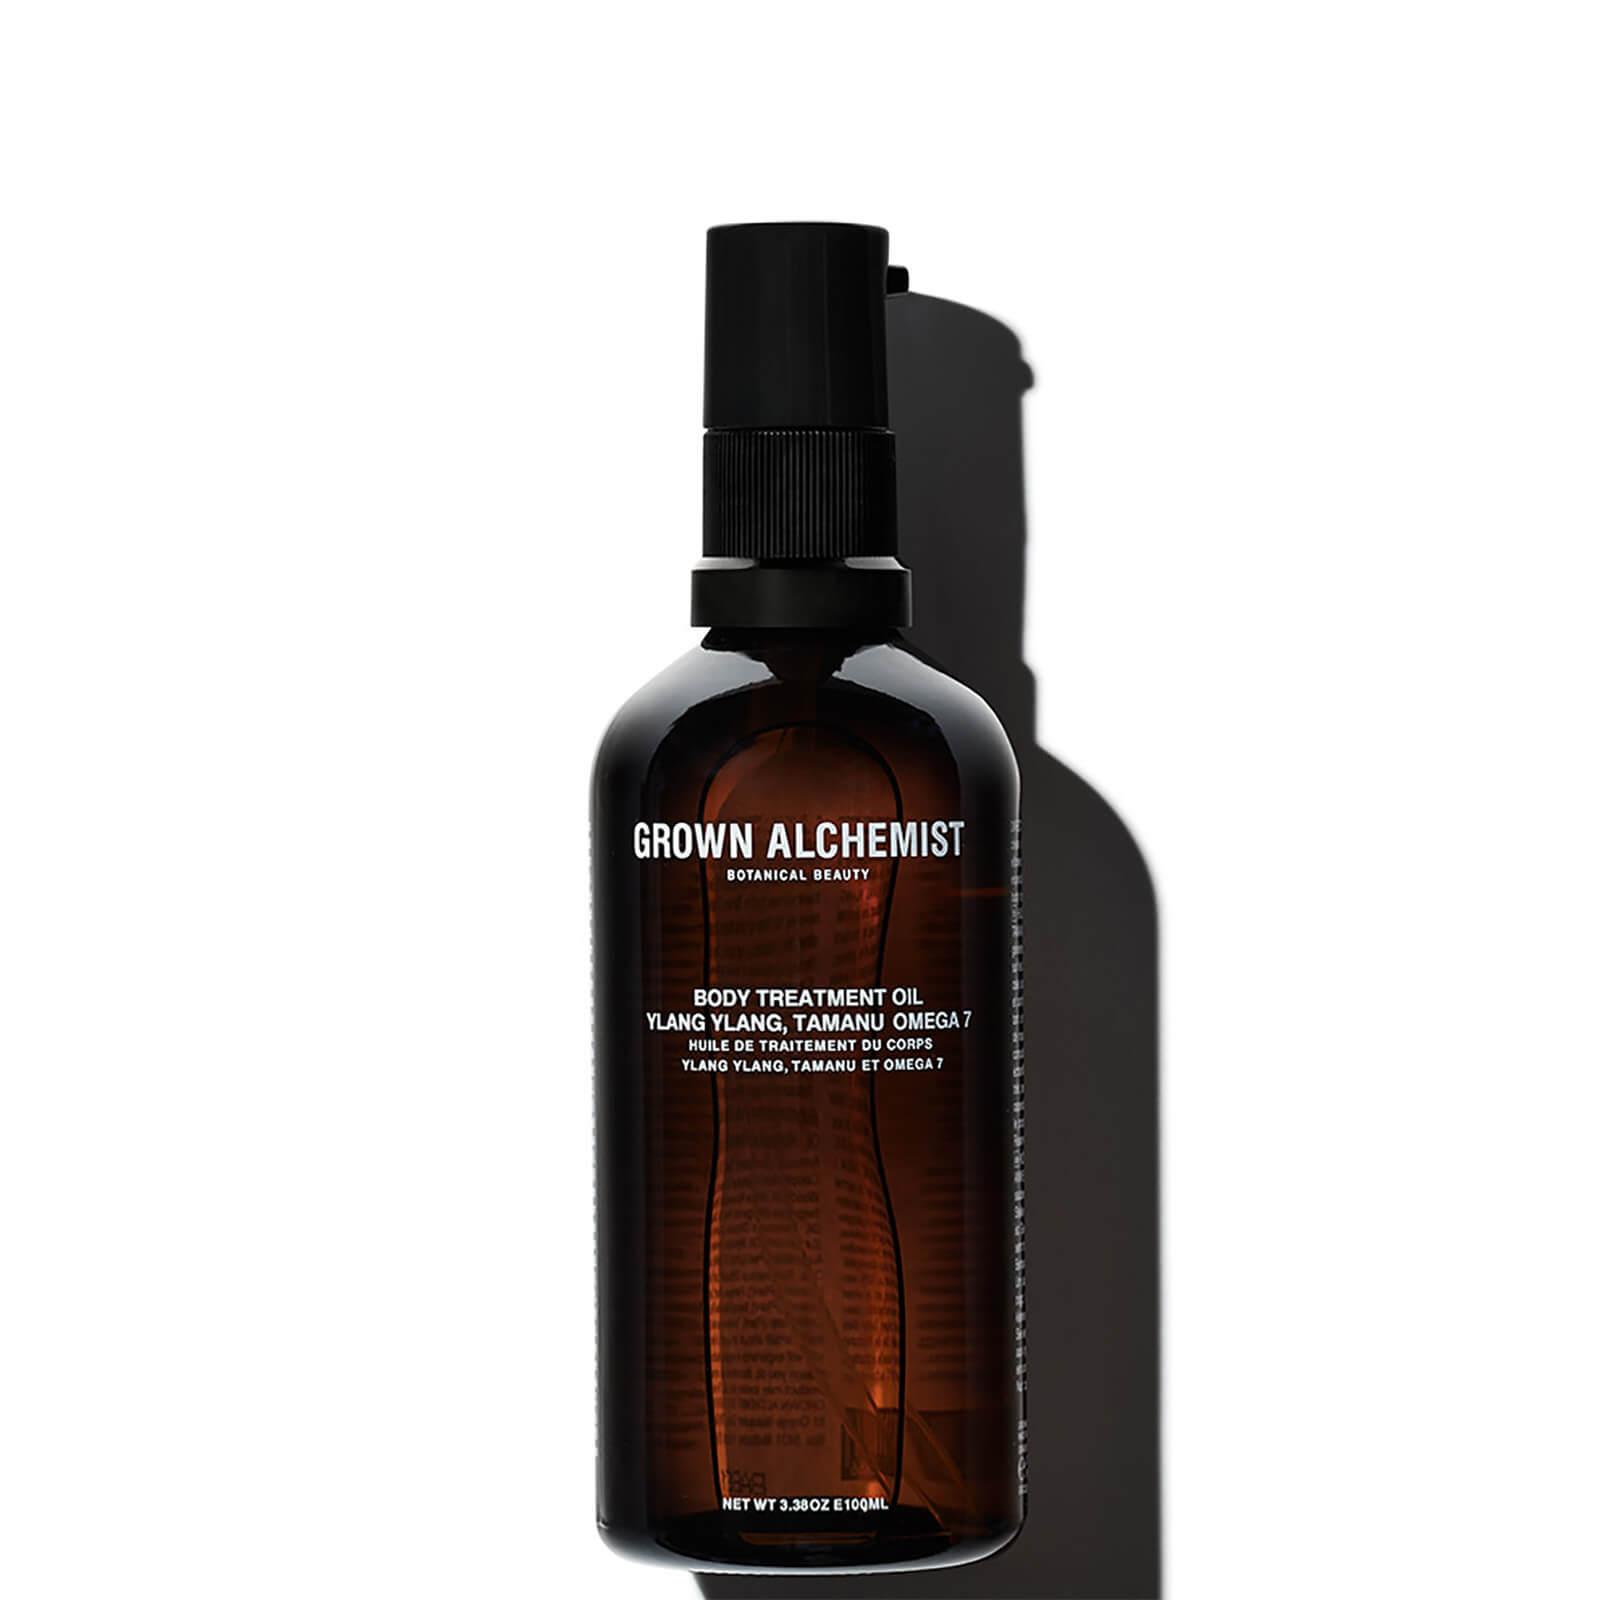 Купить Grown Alchemist Body Treatment Oil - Ylang Ylang Tamanu Omega 7 100ml